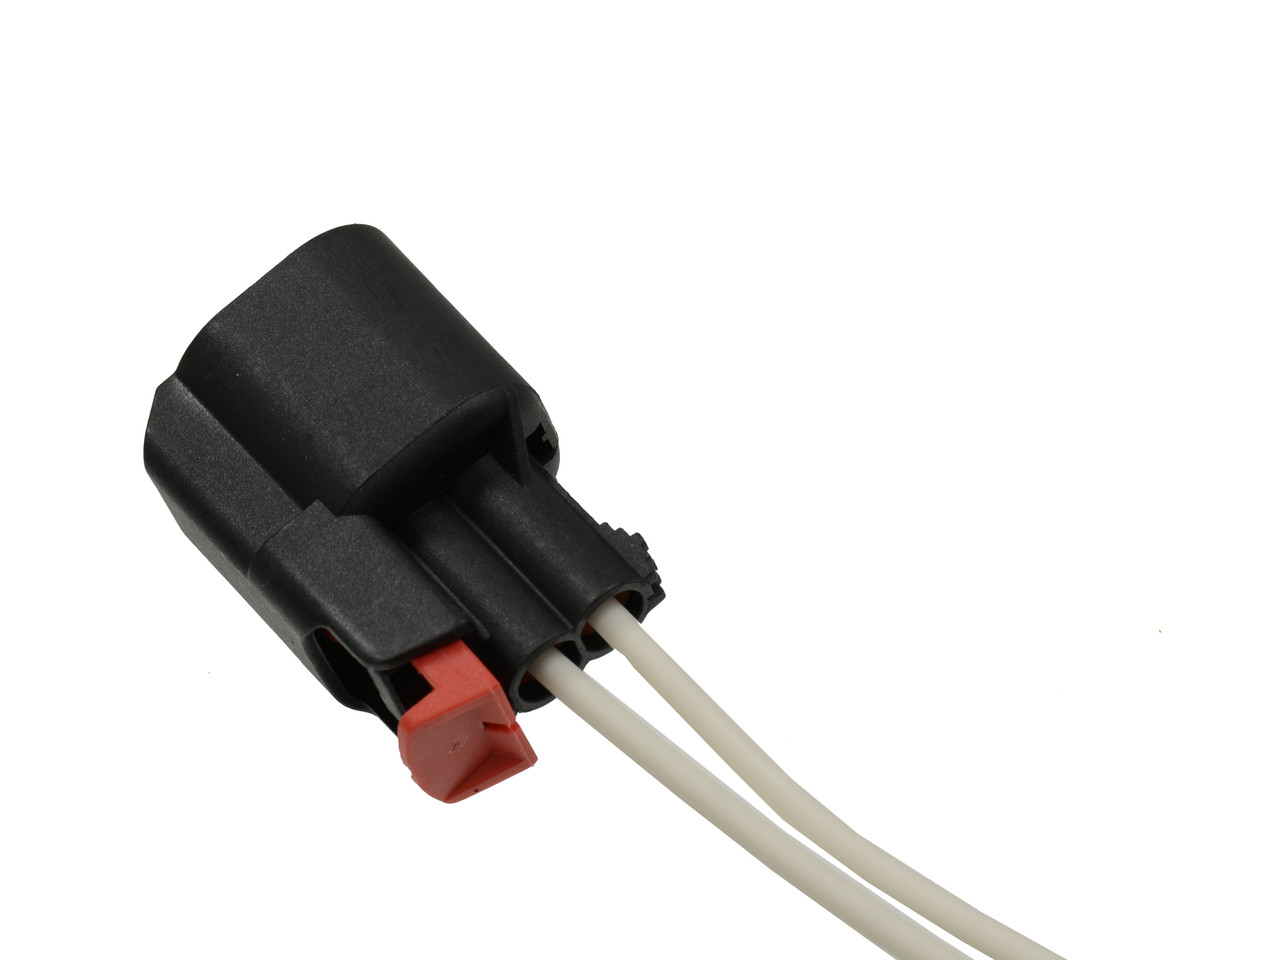 michigan motorsports dodge jeep fuel injector connector wiring repair harness kit fits wrangler jk tj [ 1280 x 960 Pixel ]